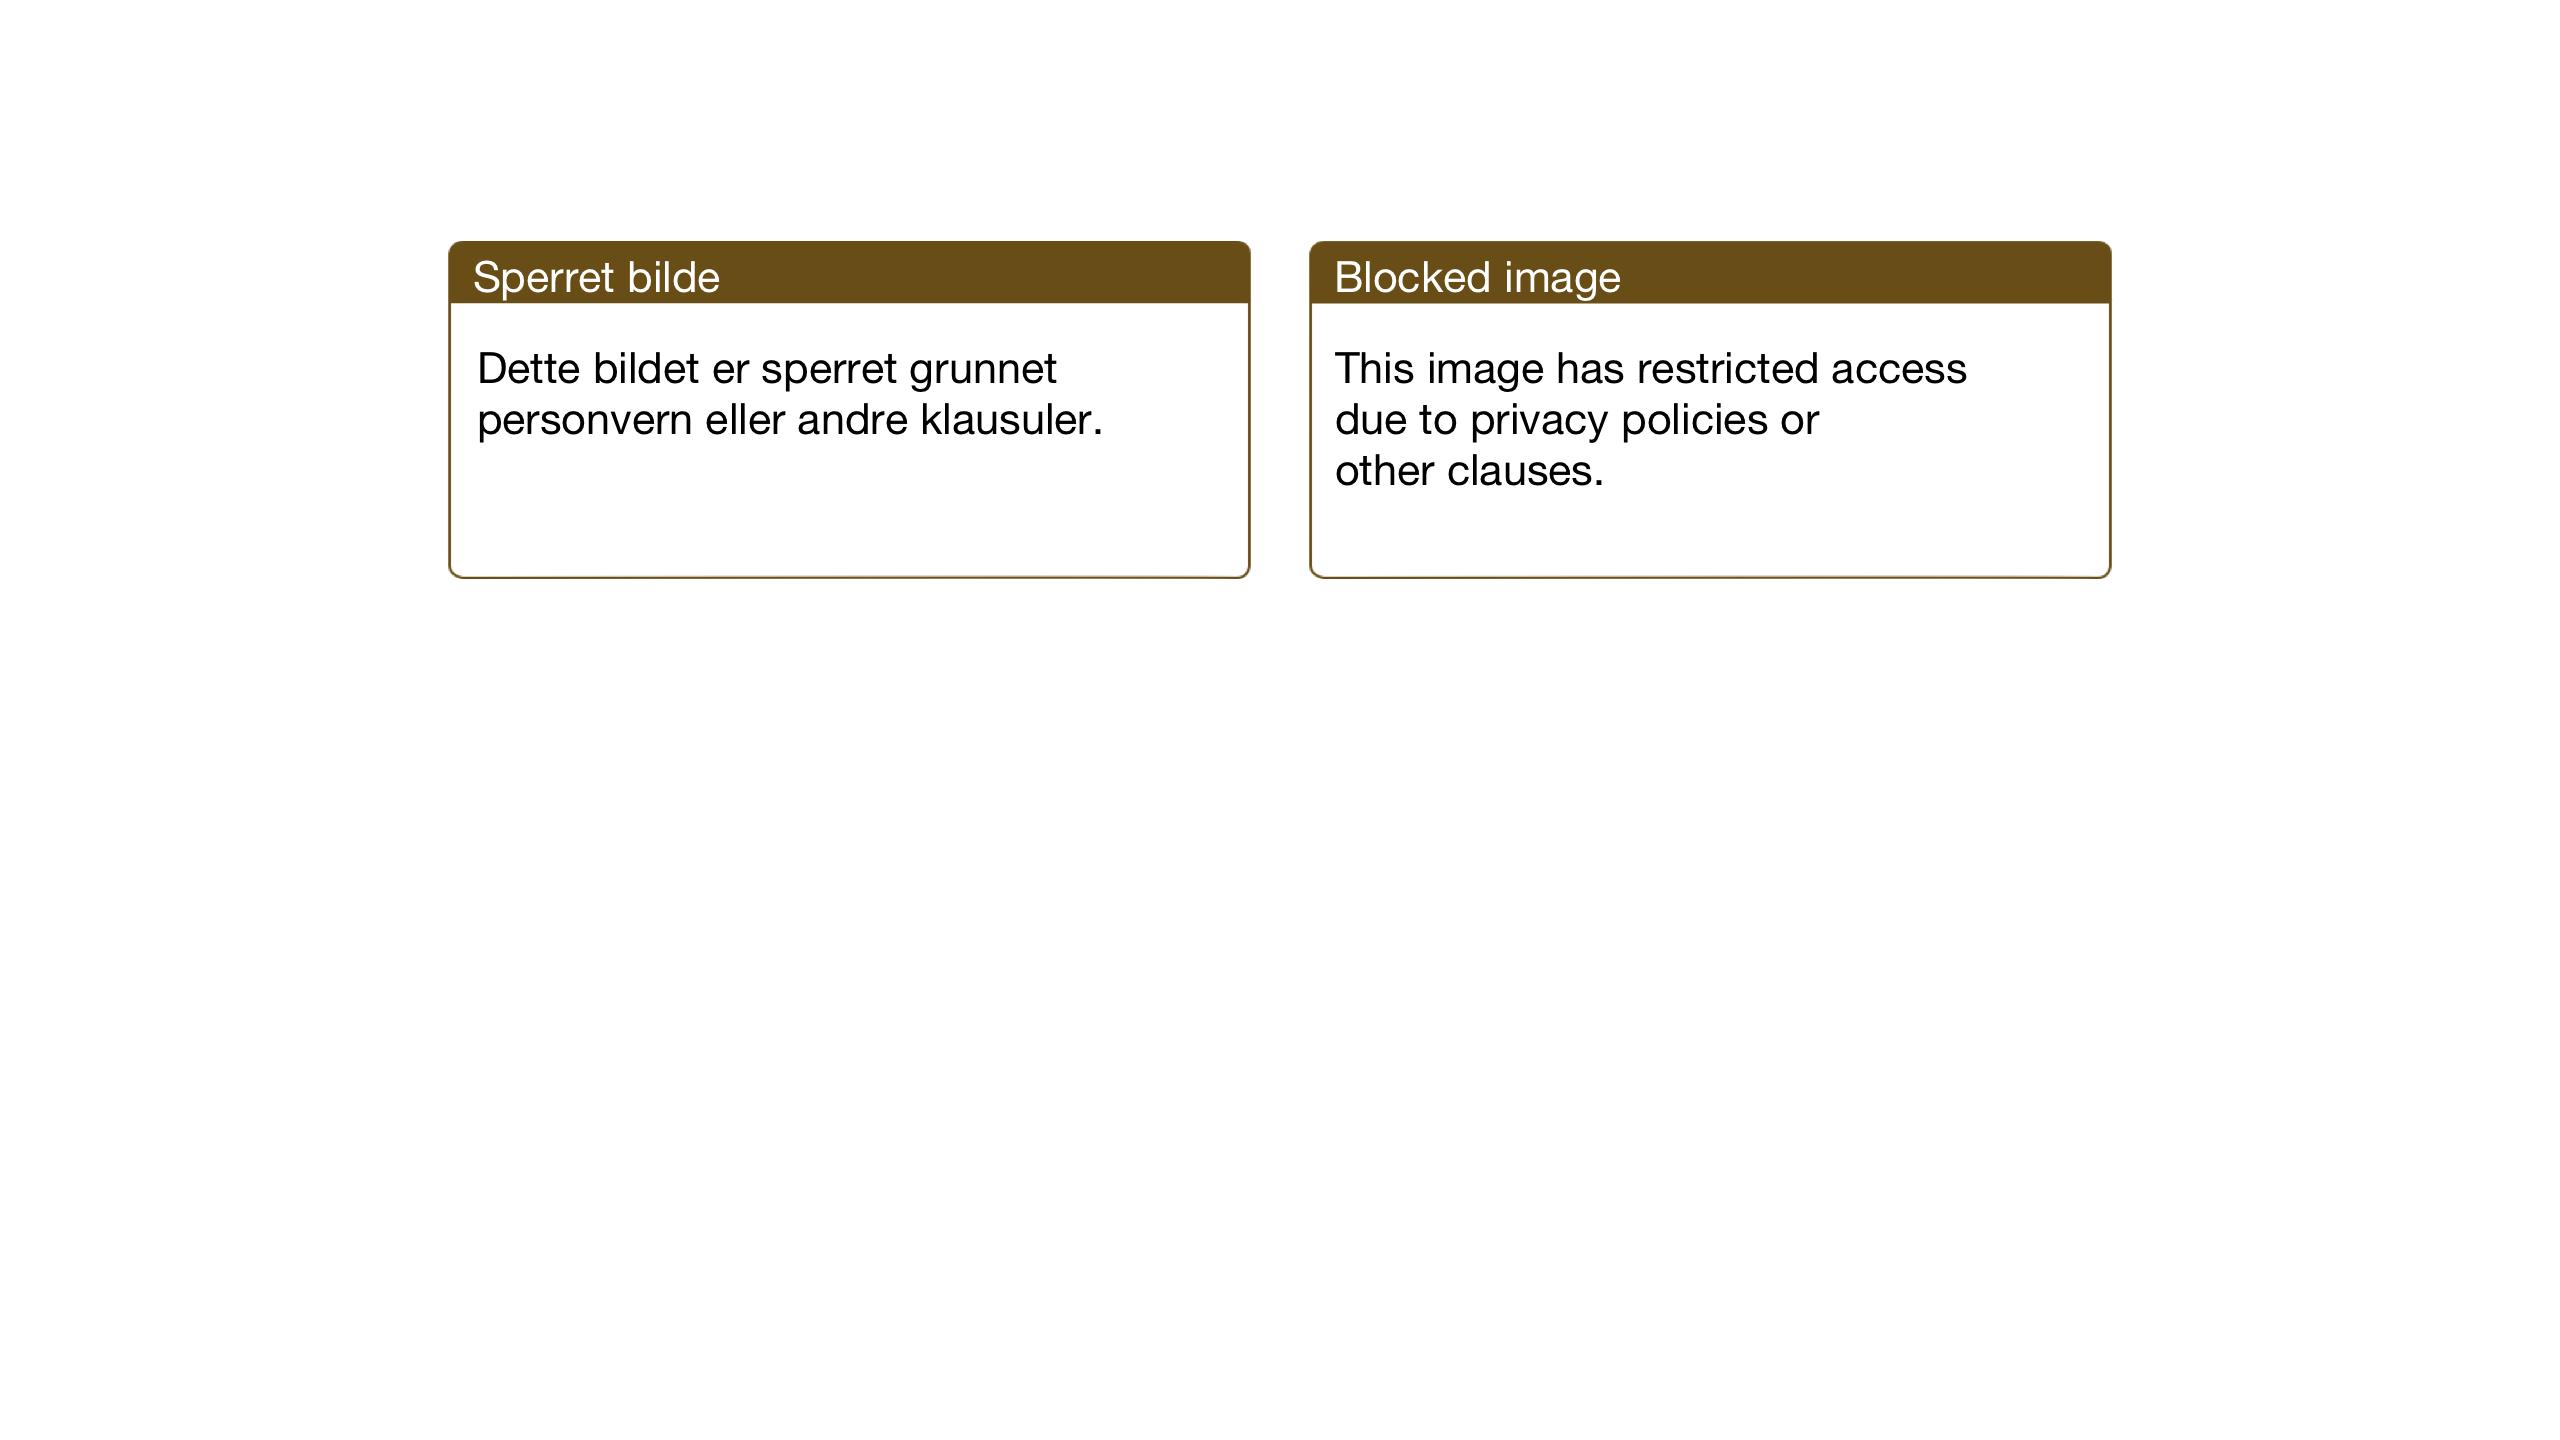 SAB, Domkirken Sokneprestembete, H/Haa: Ministerialbok nr. C 9, 1958-2001, s. 41b-42a